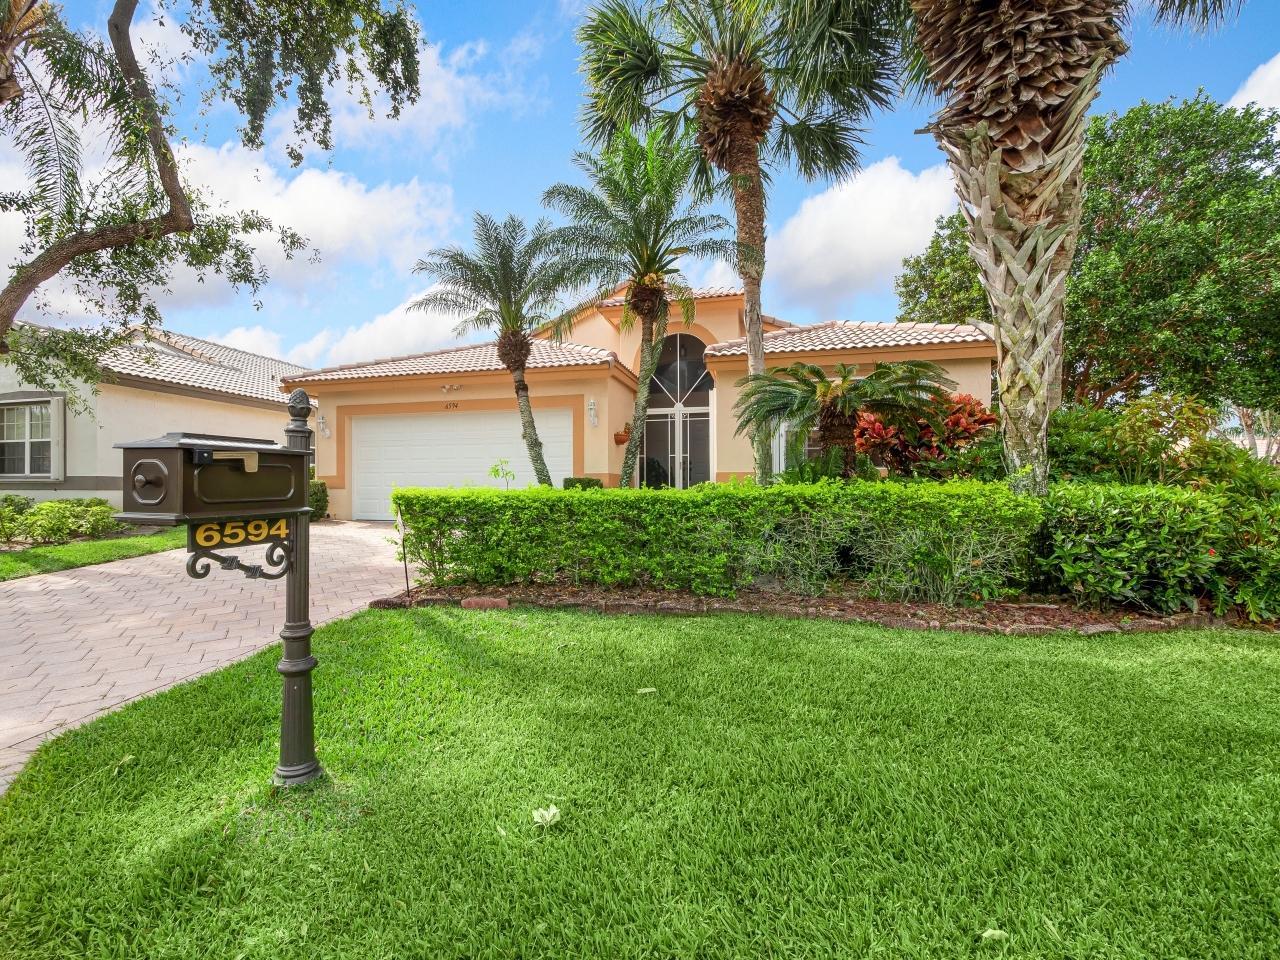 6594 Bayhill Terrace Boynton Beach, FL 33437